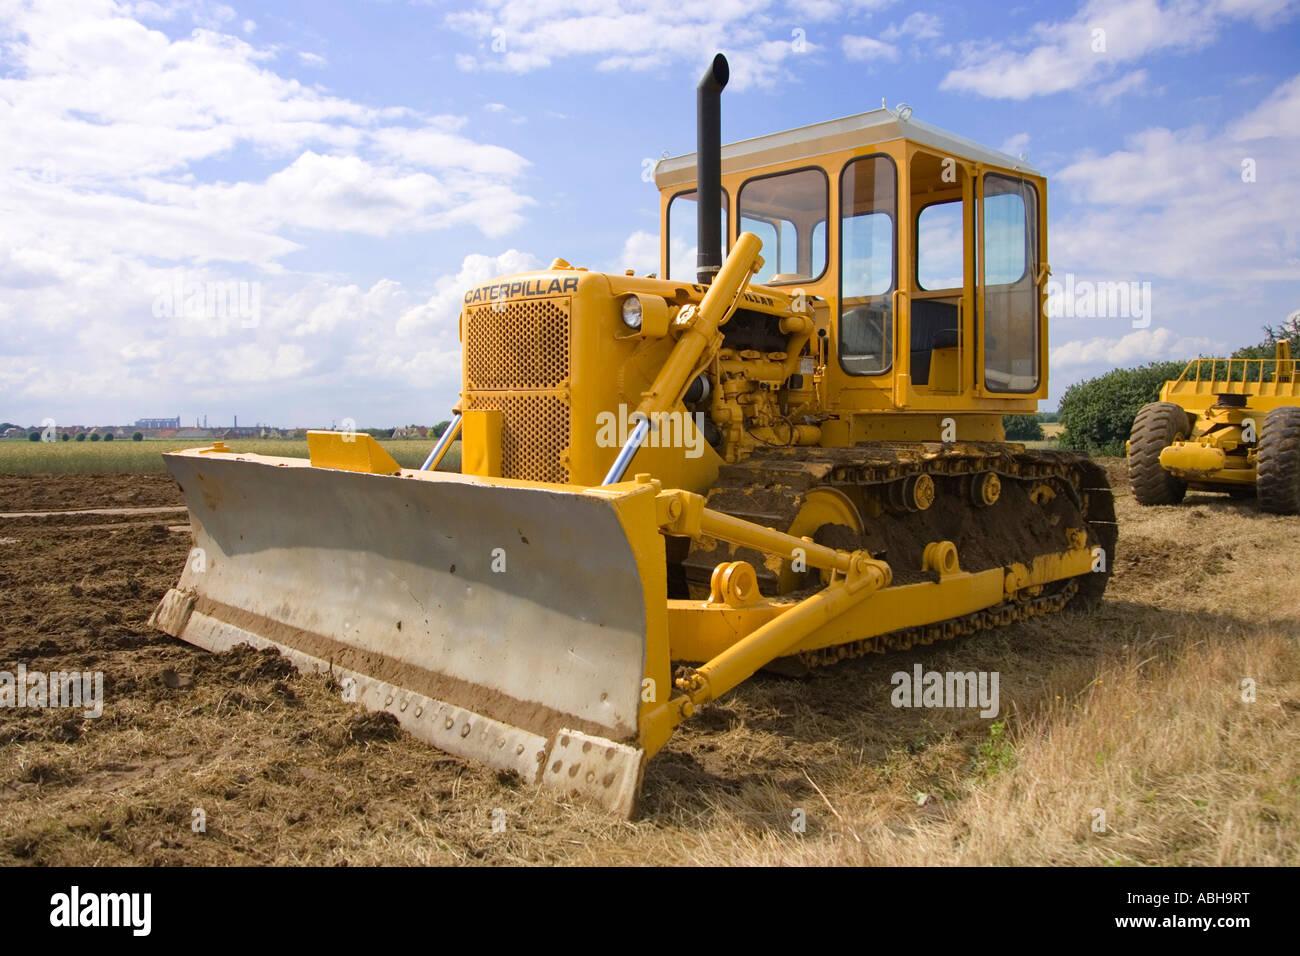 Caterpiller bulldozer - Stock Image